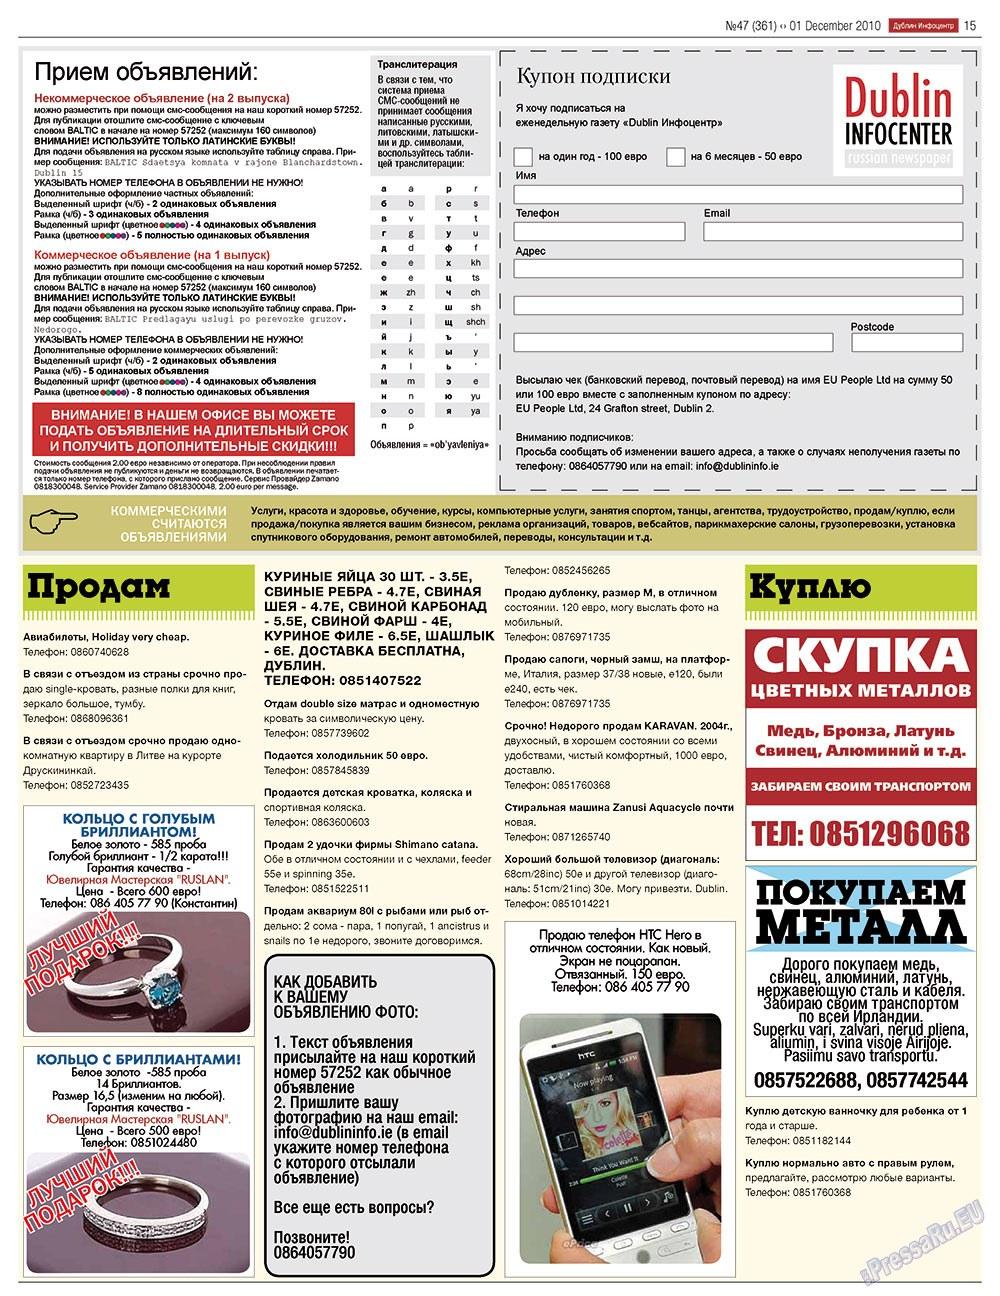 Дублин инфоцентр (газета). 2010 год, номер 47, стр. 15